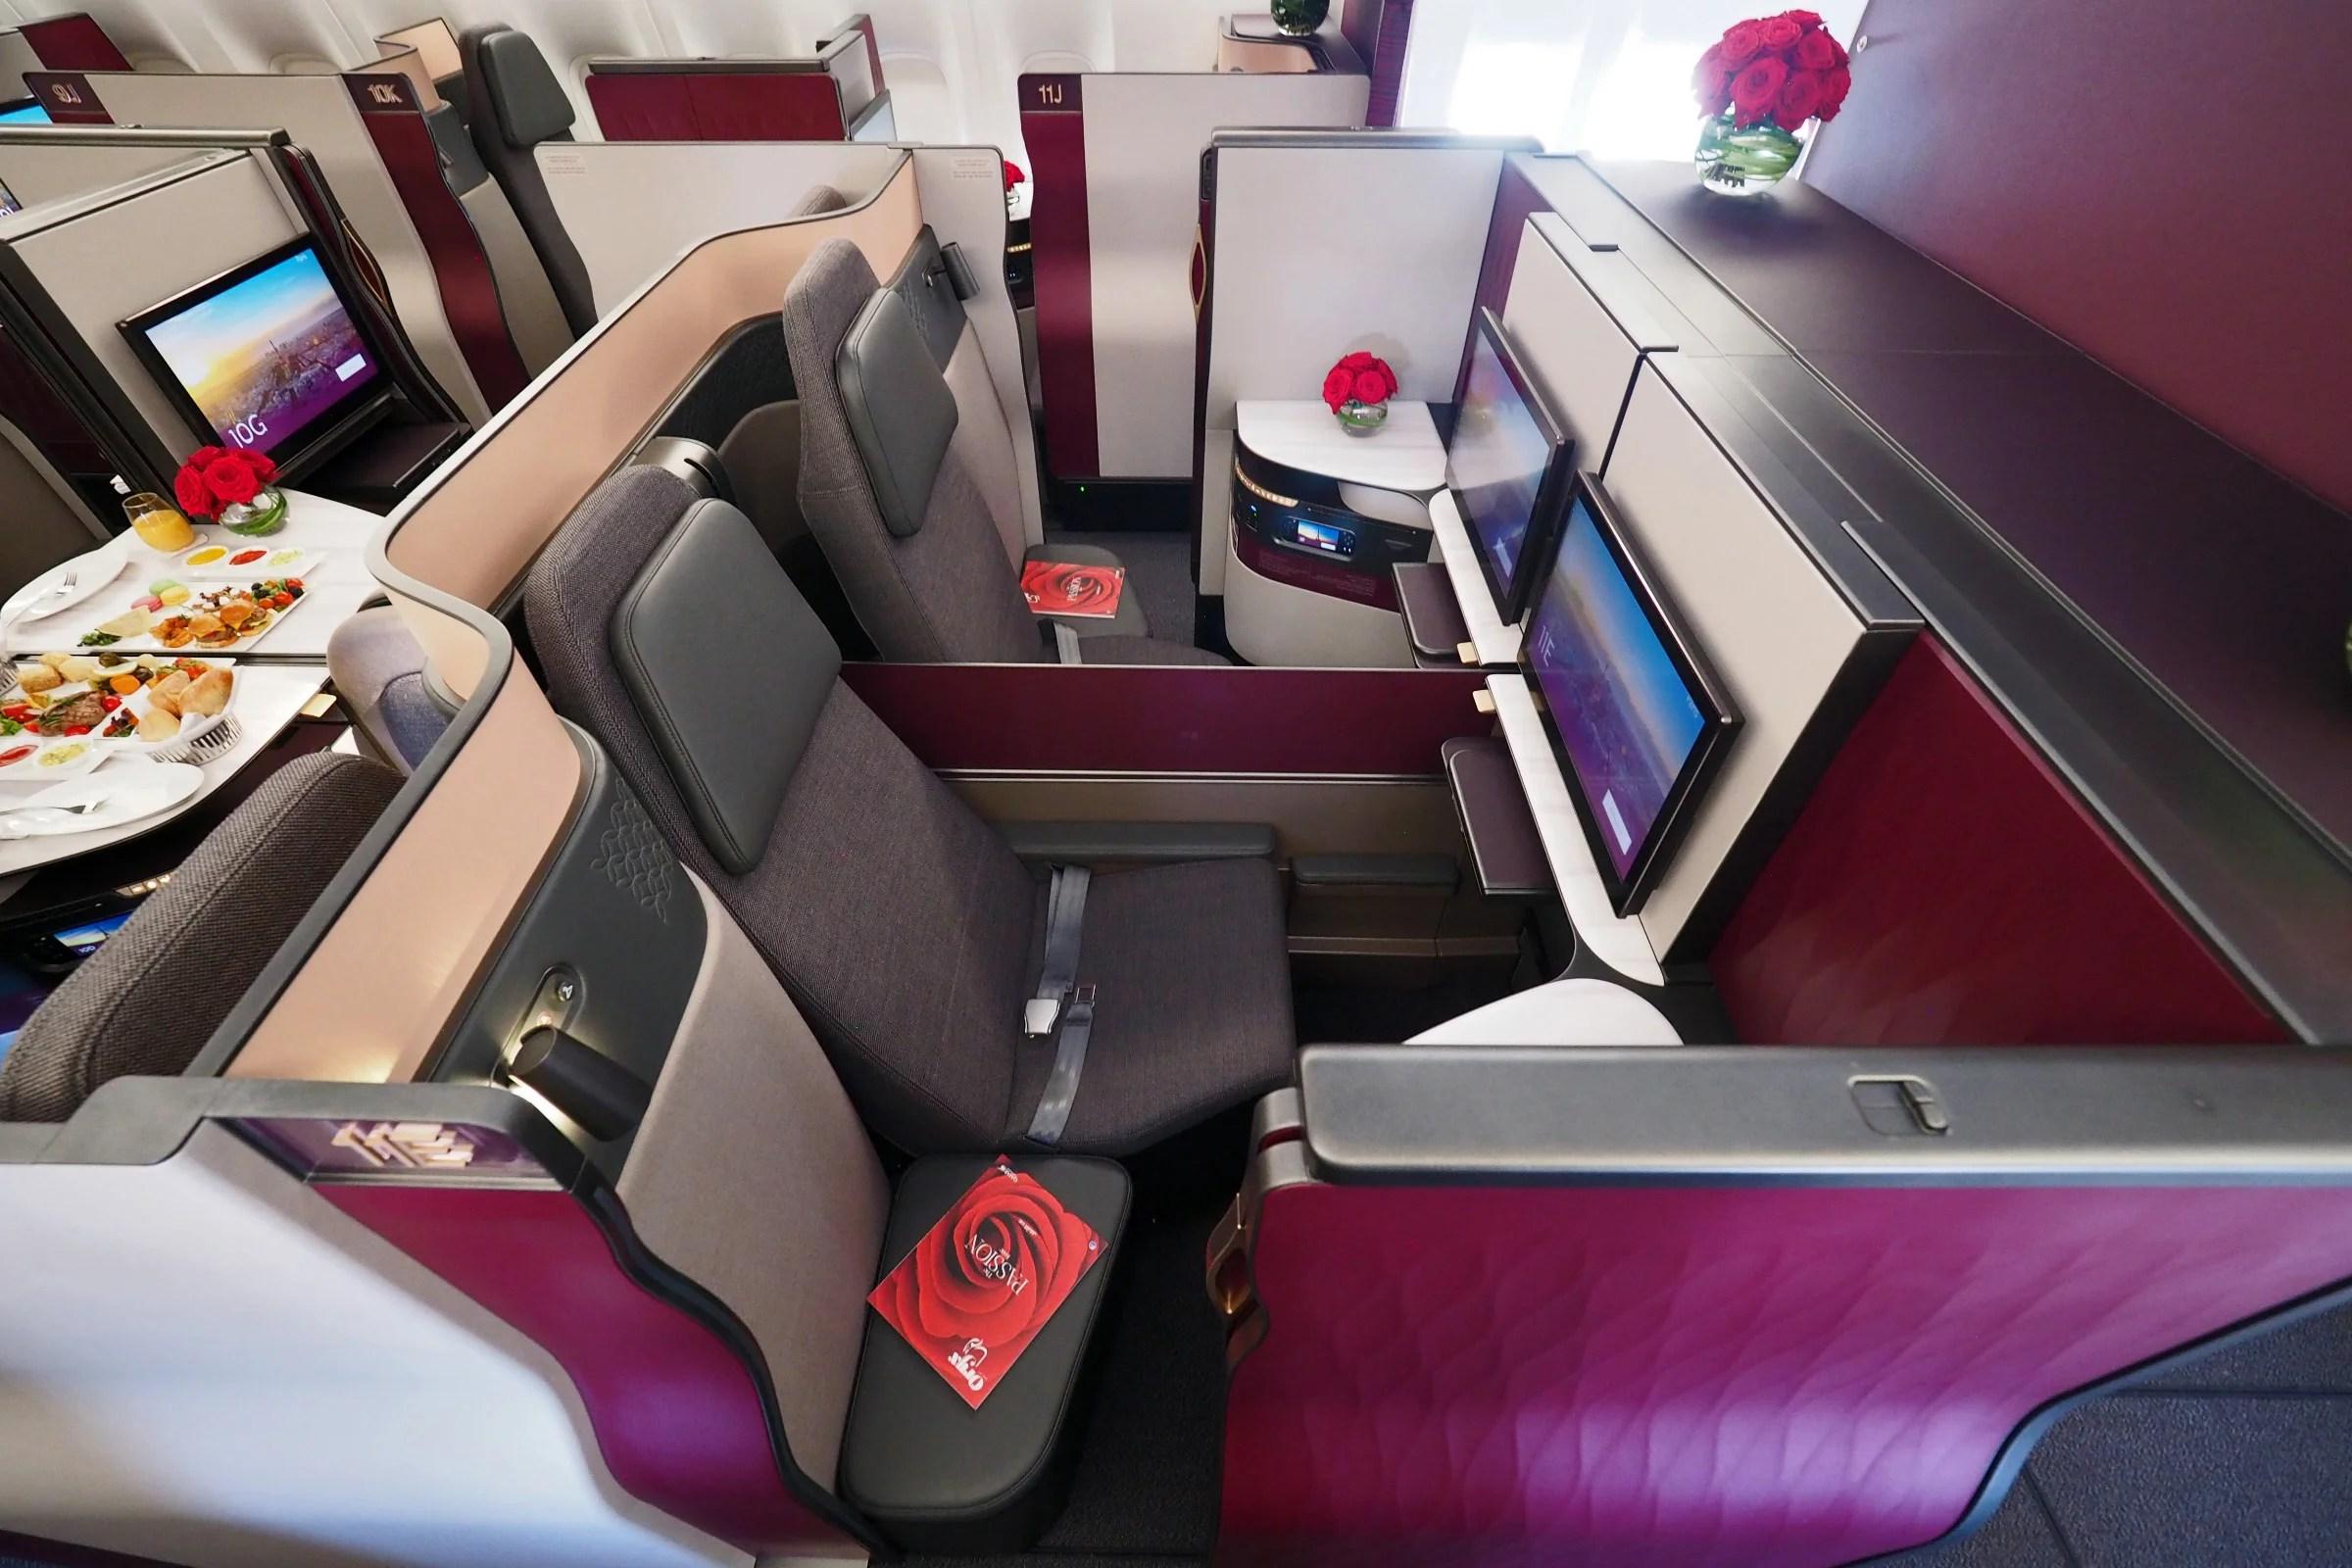 Qatar Privilege Club Promo Puts You on a Fast Track to Elite Oneworld Status